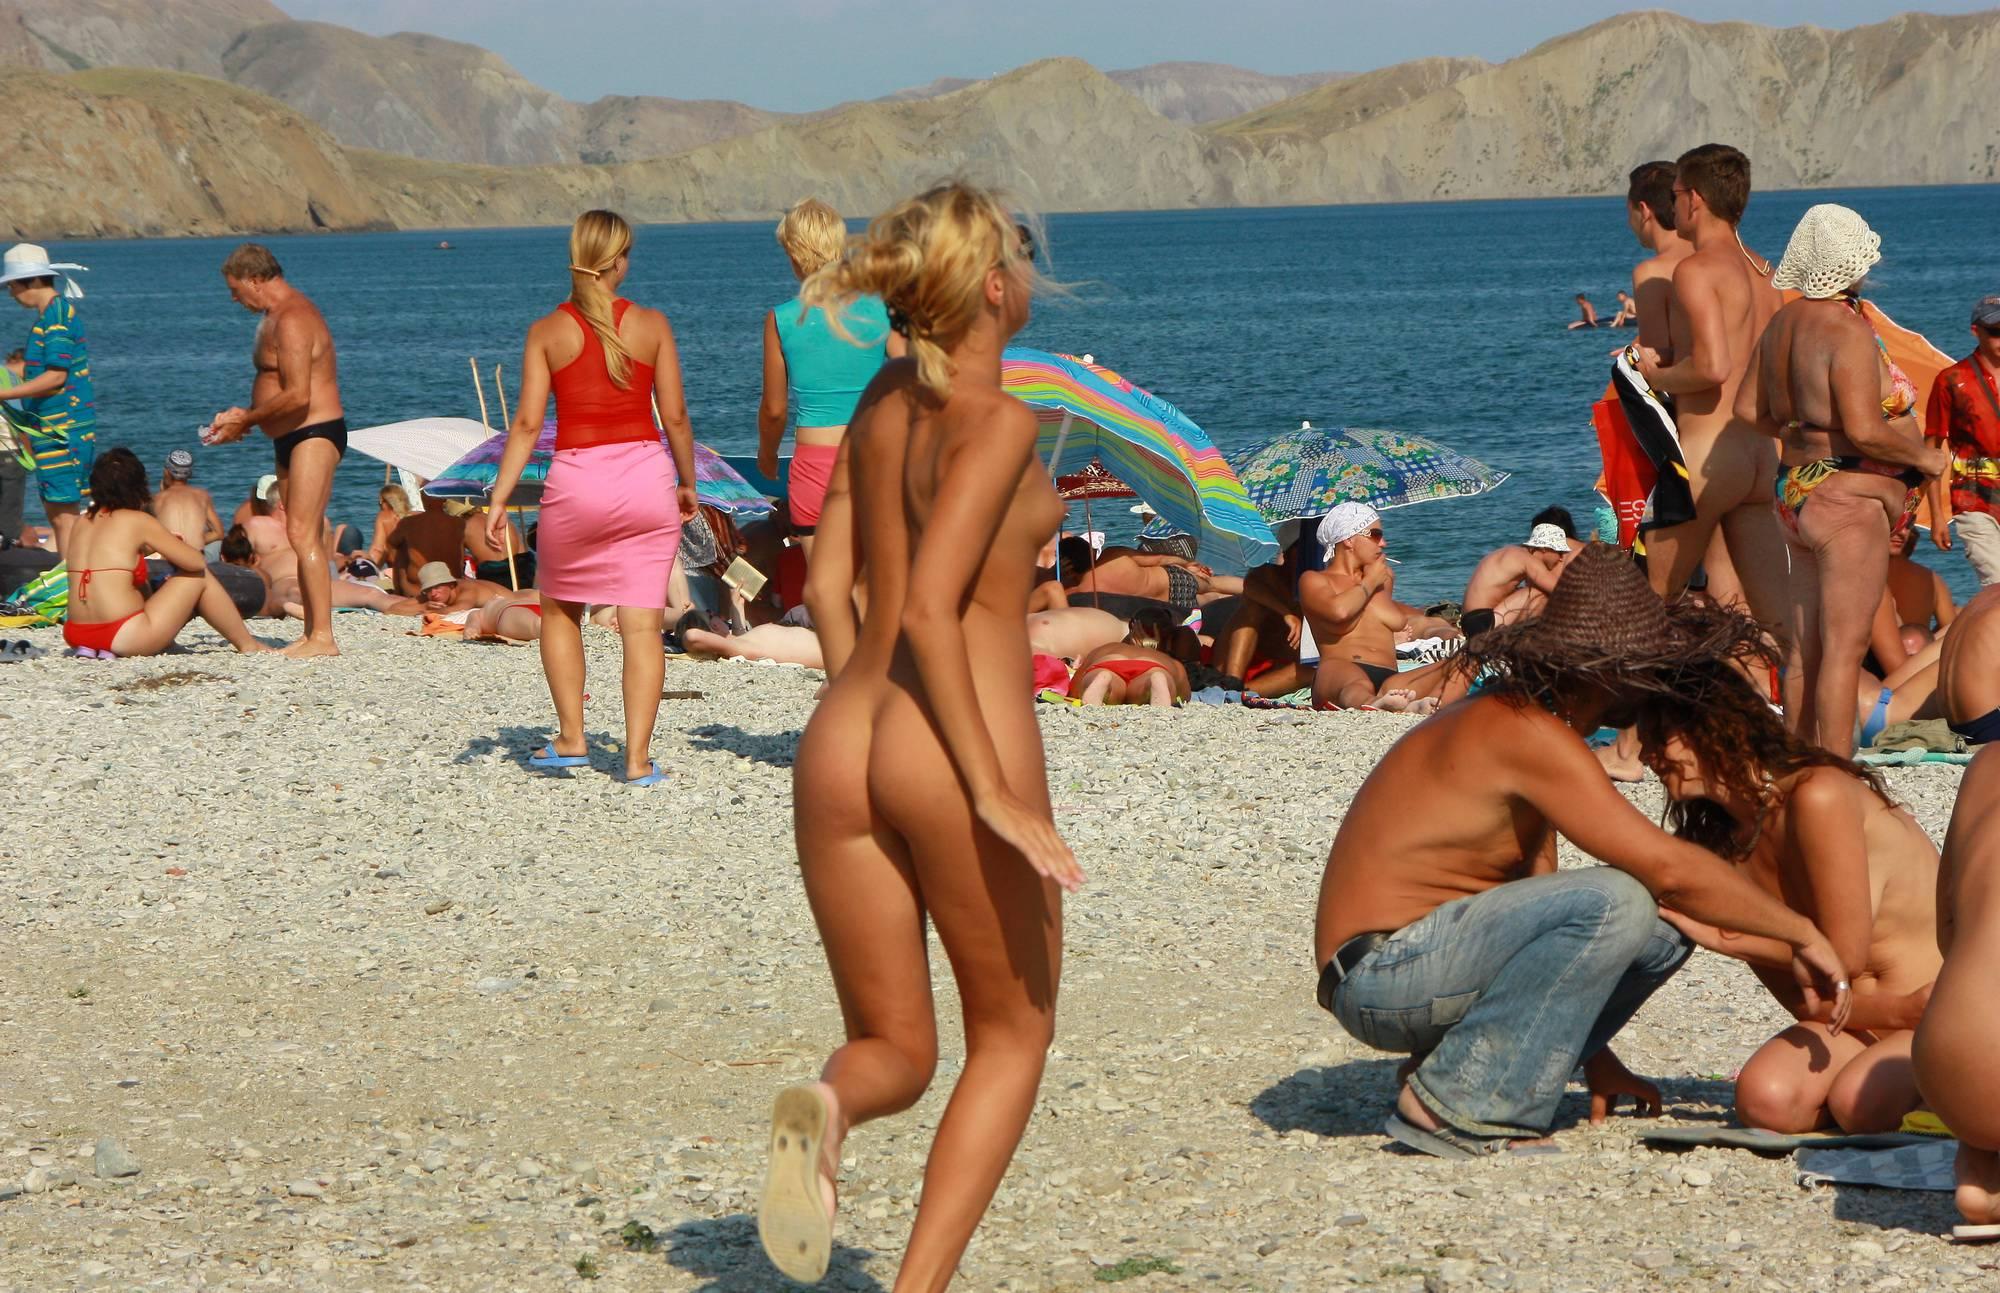 Nudist Photos Ukraine Beach Girlfriends - 1